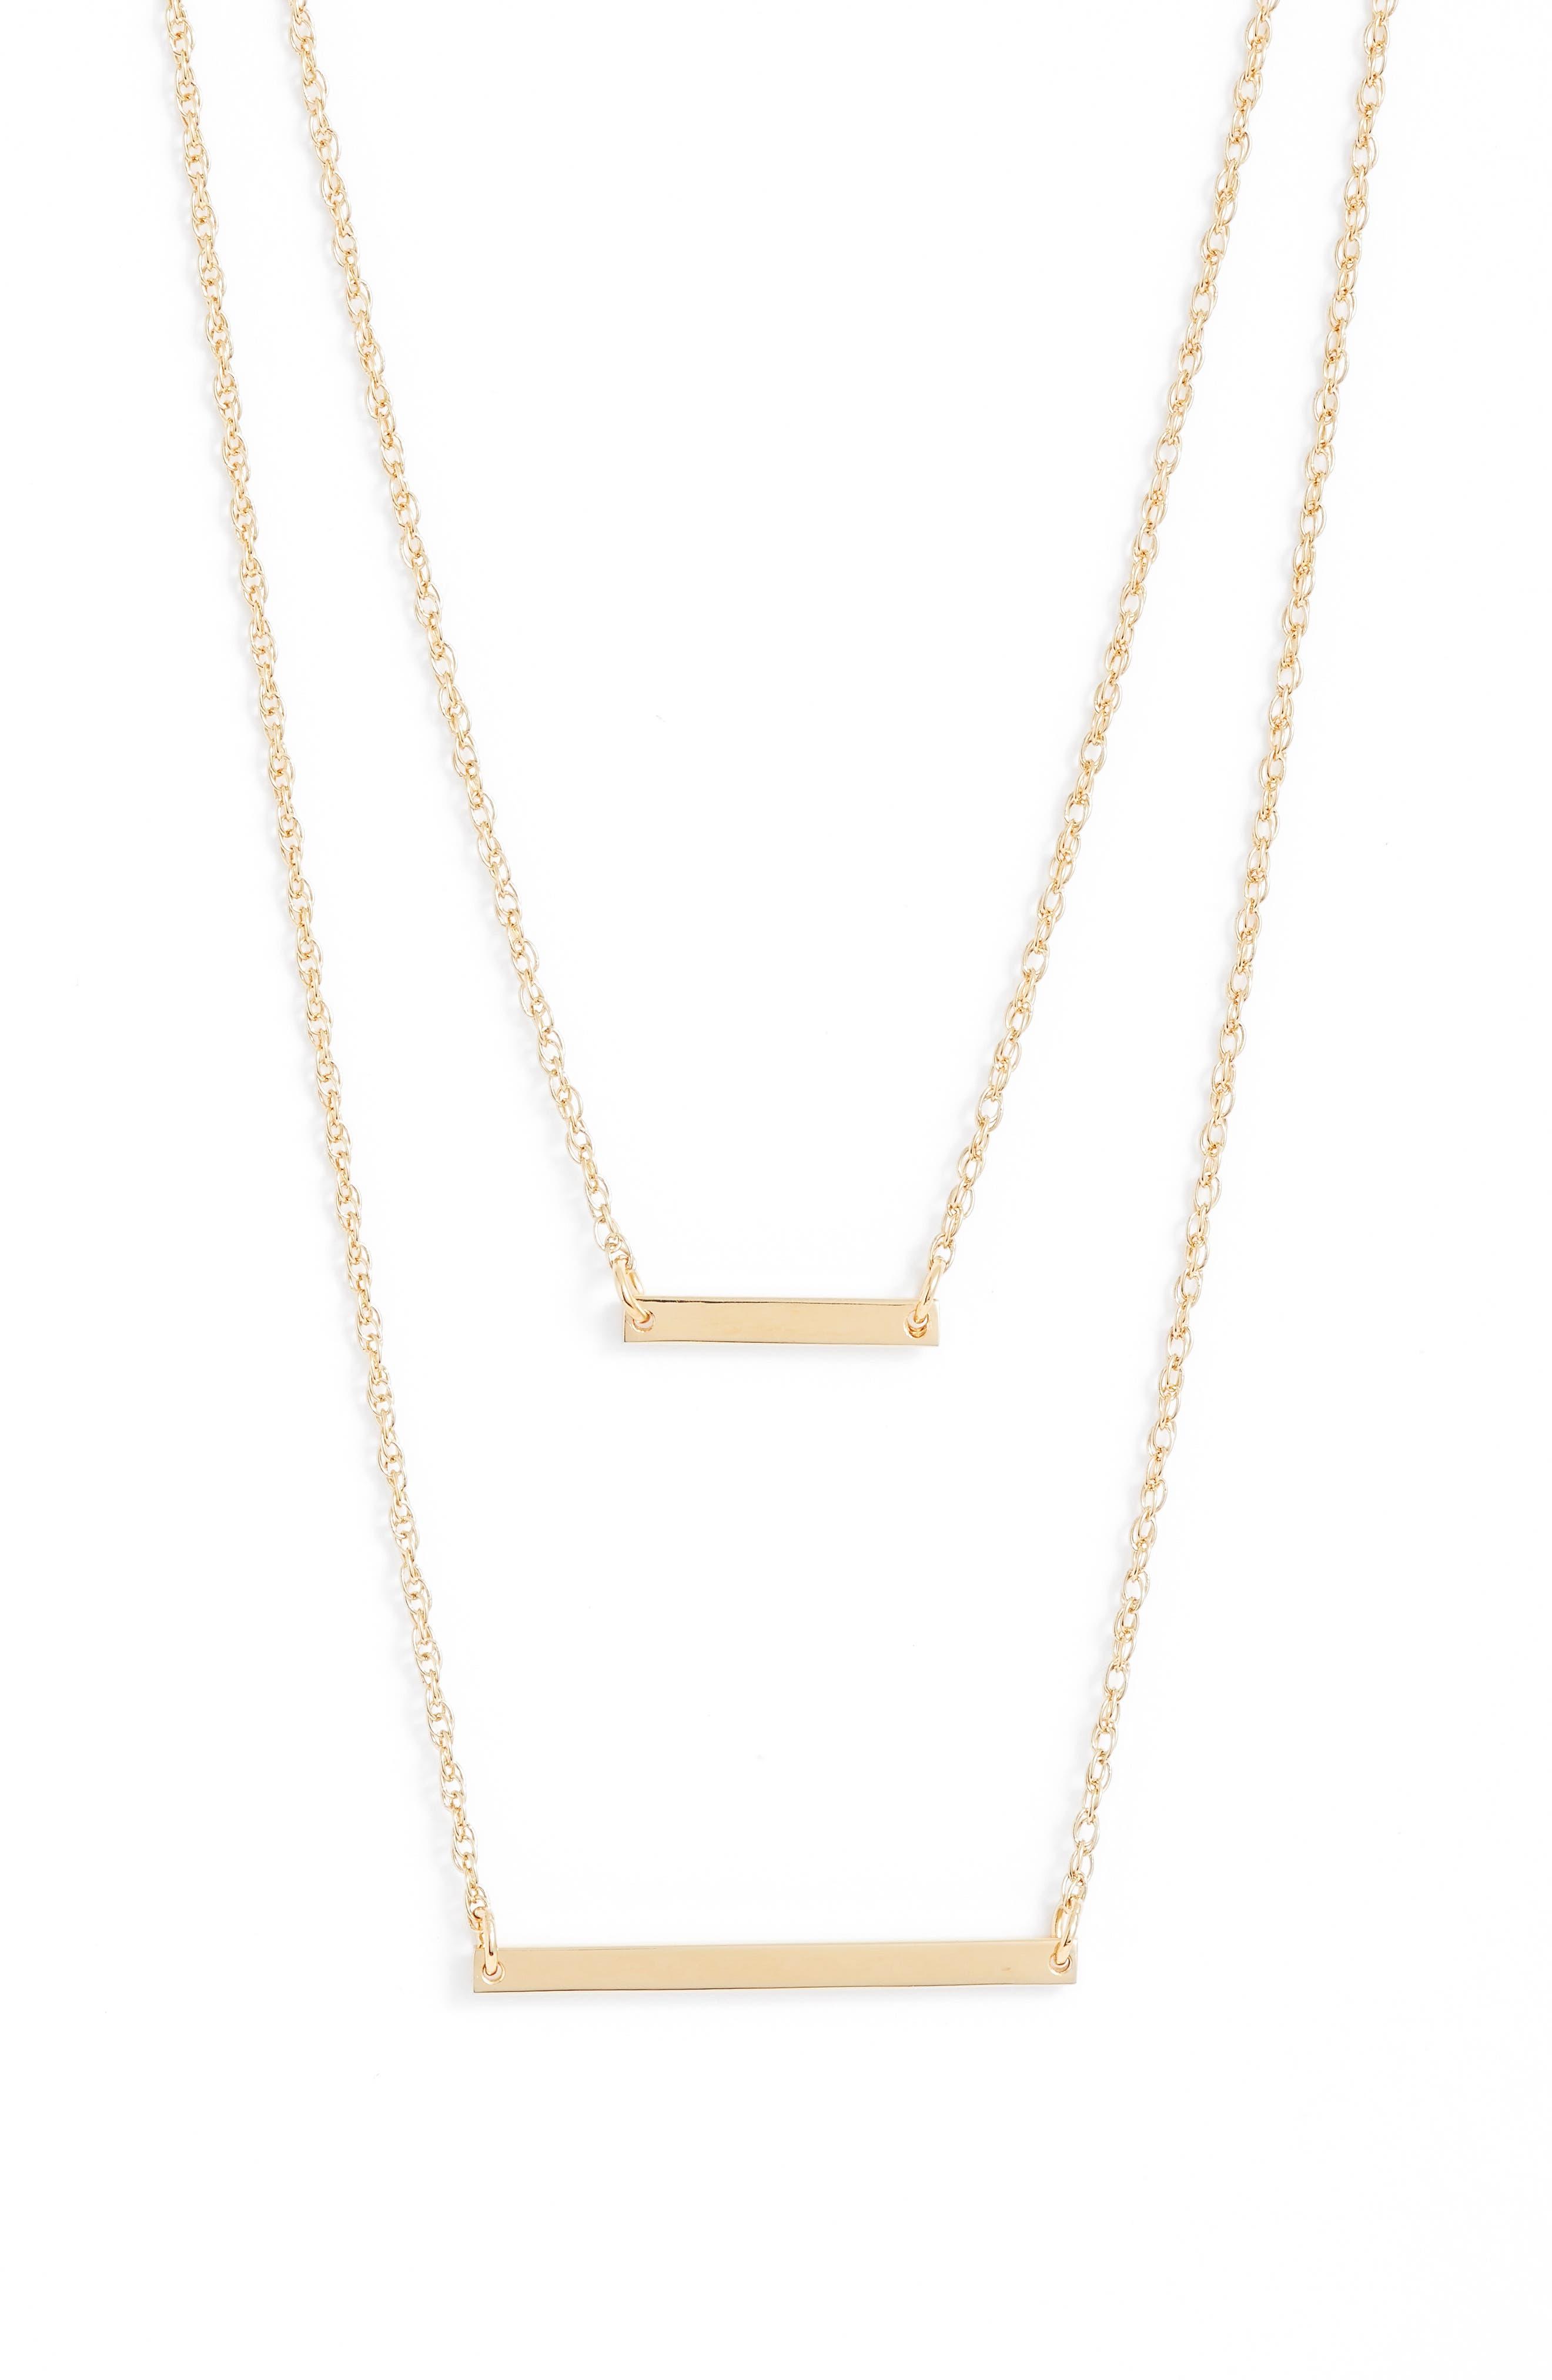 JENNIFER ZEUNER Cynthia Layered Pendant Necklace, Main, color, GOLD VERMEIL